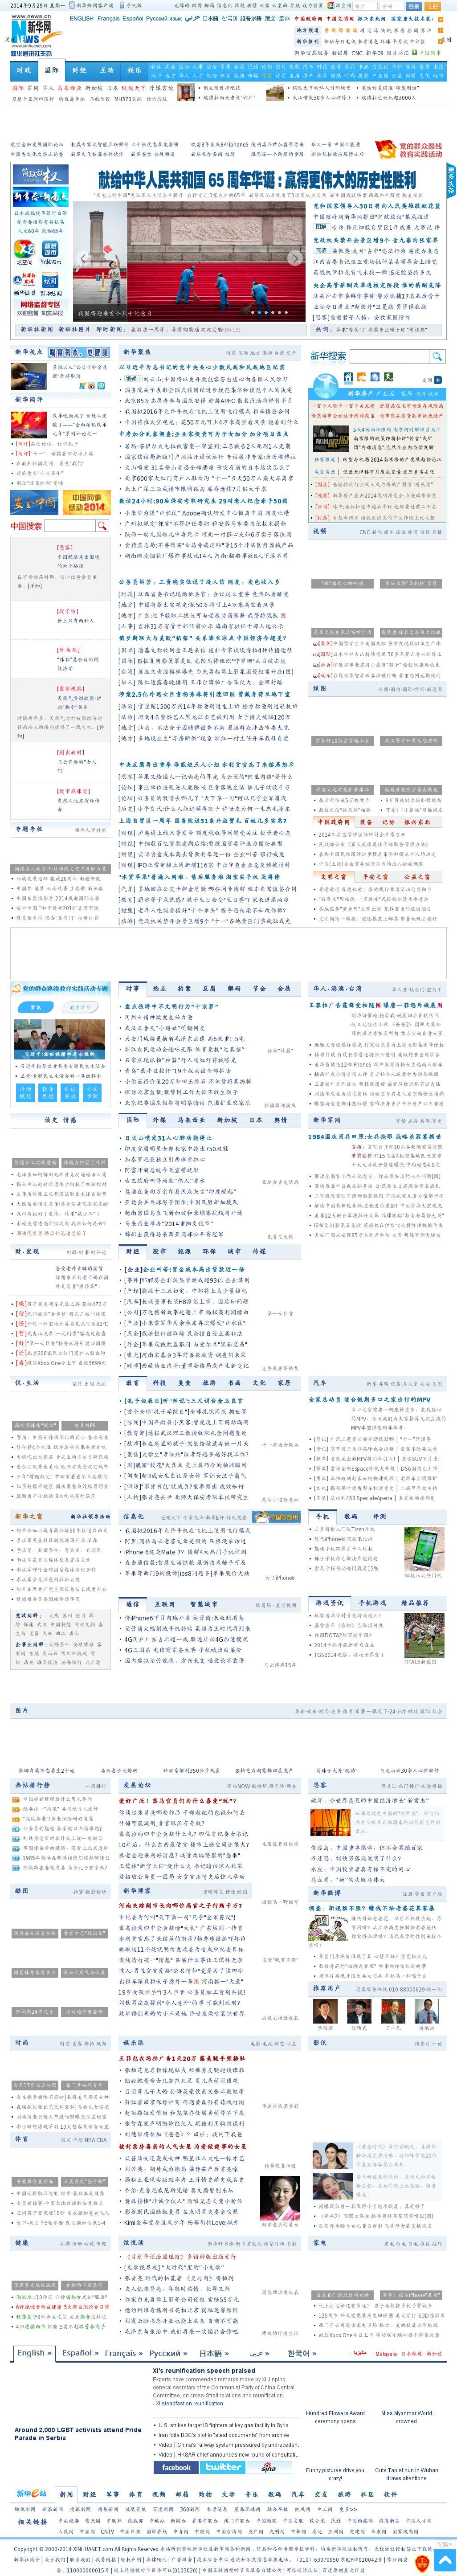 Xinhua at Monday Sept. 29, 2014, 1:21 a.m. UTC